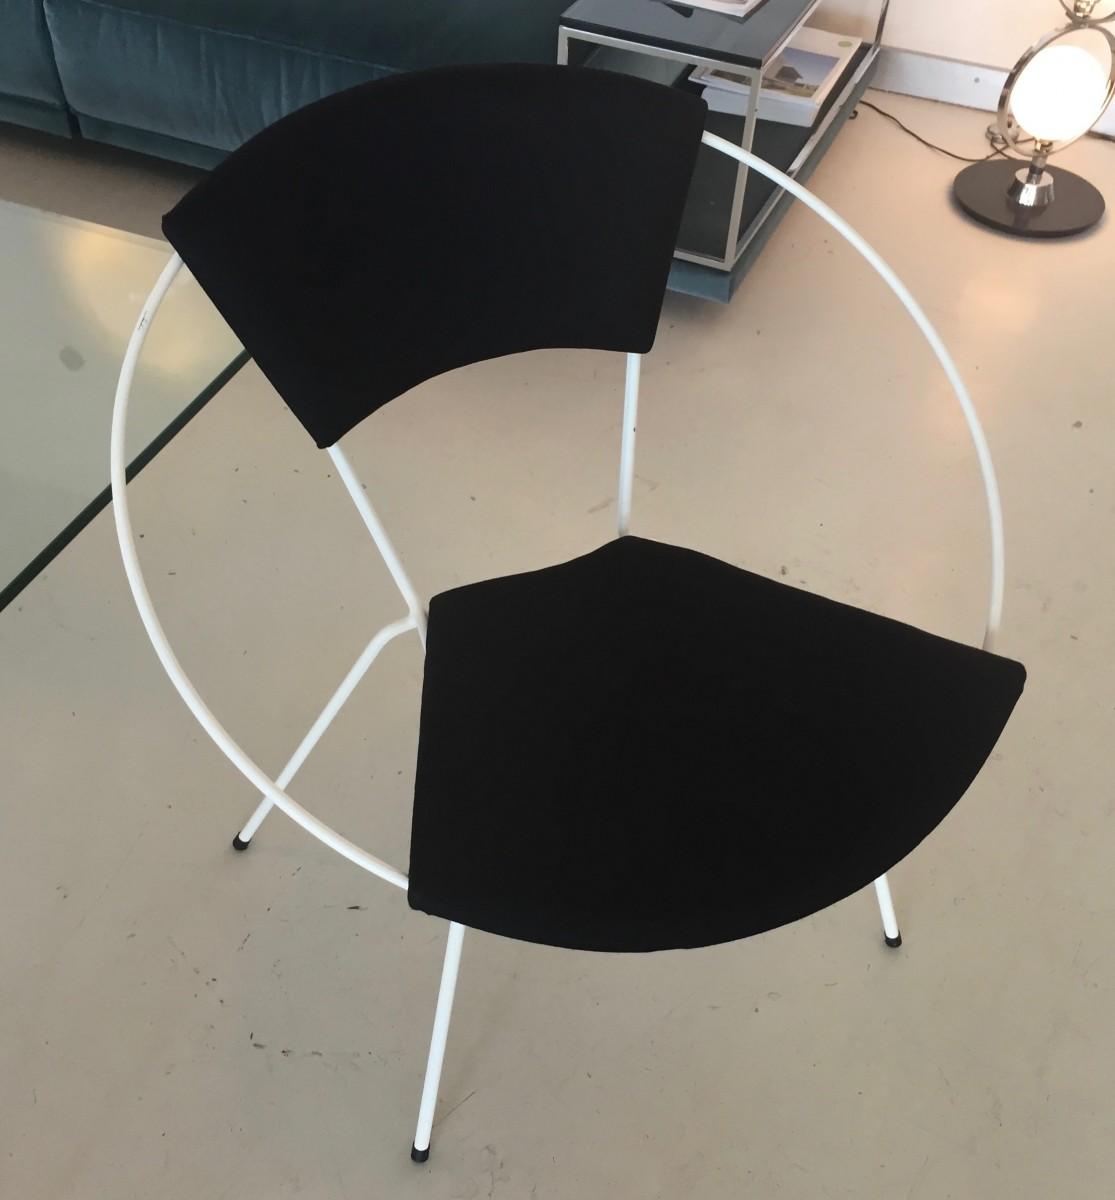 designer sessel schweiz: 45 sessel finn juhl onecollection